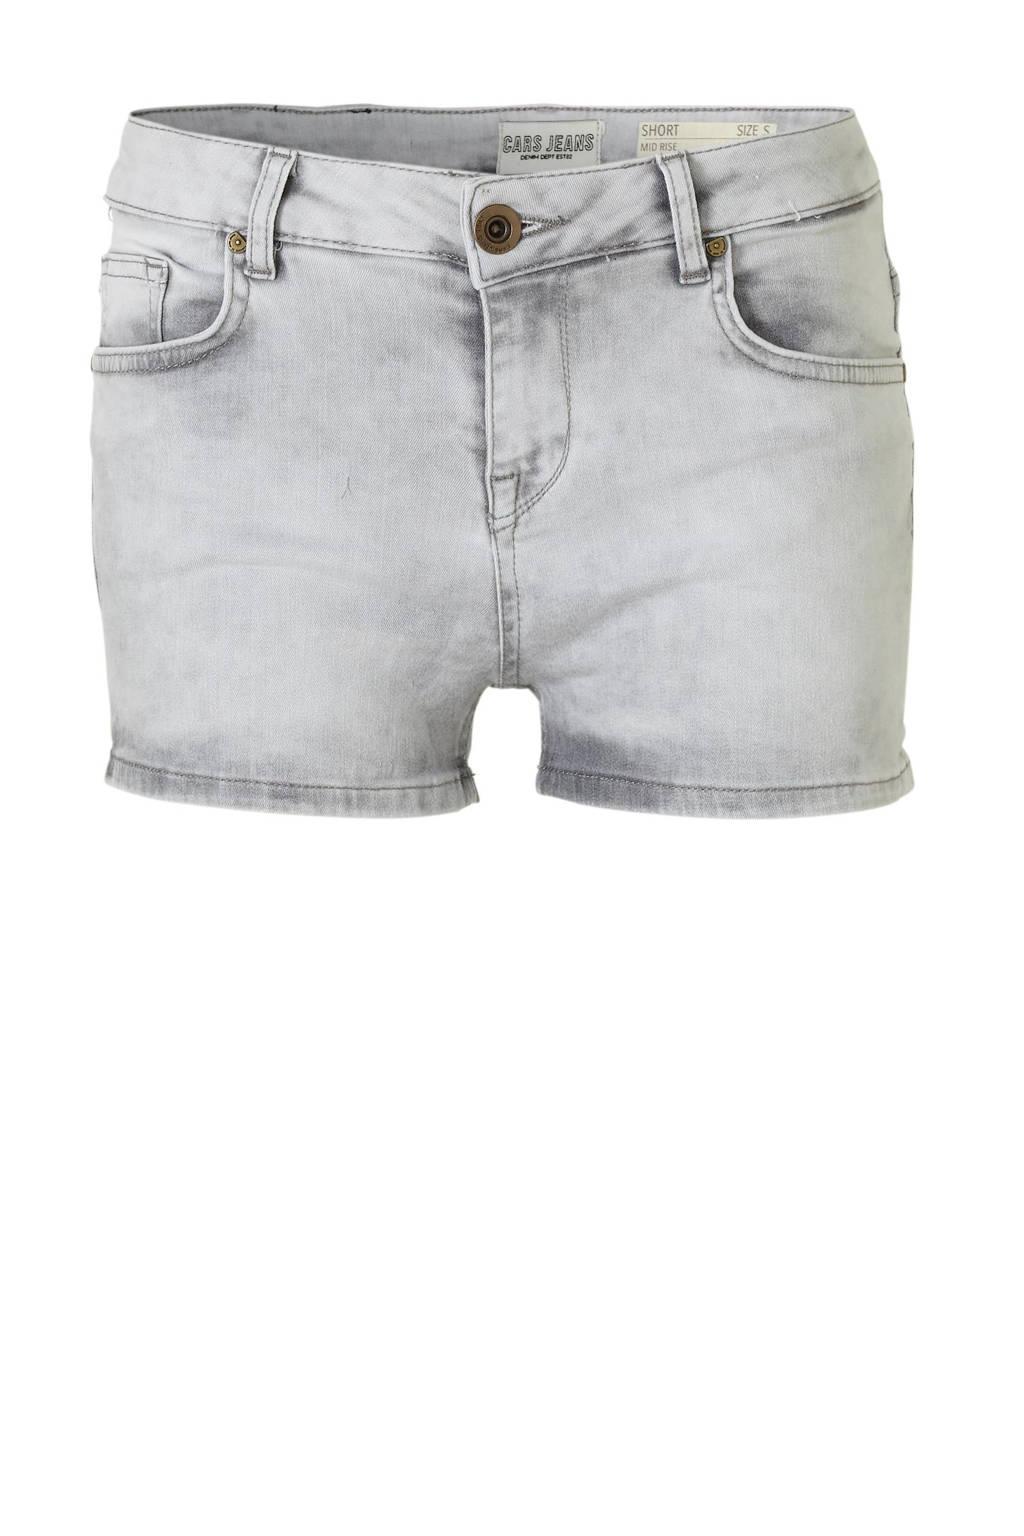 Cars jeans short Romy lichtgrijs, Lichtgrijs